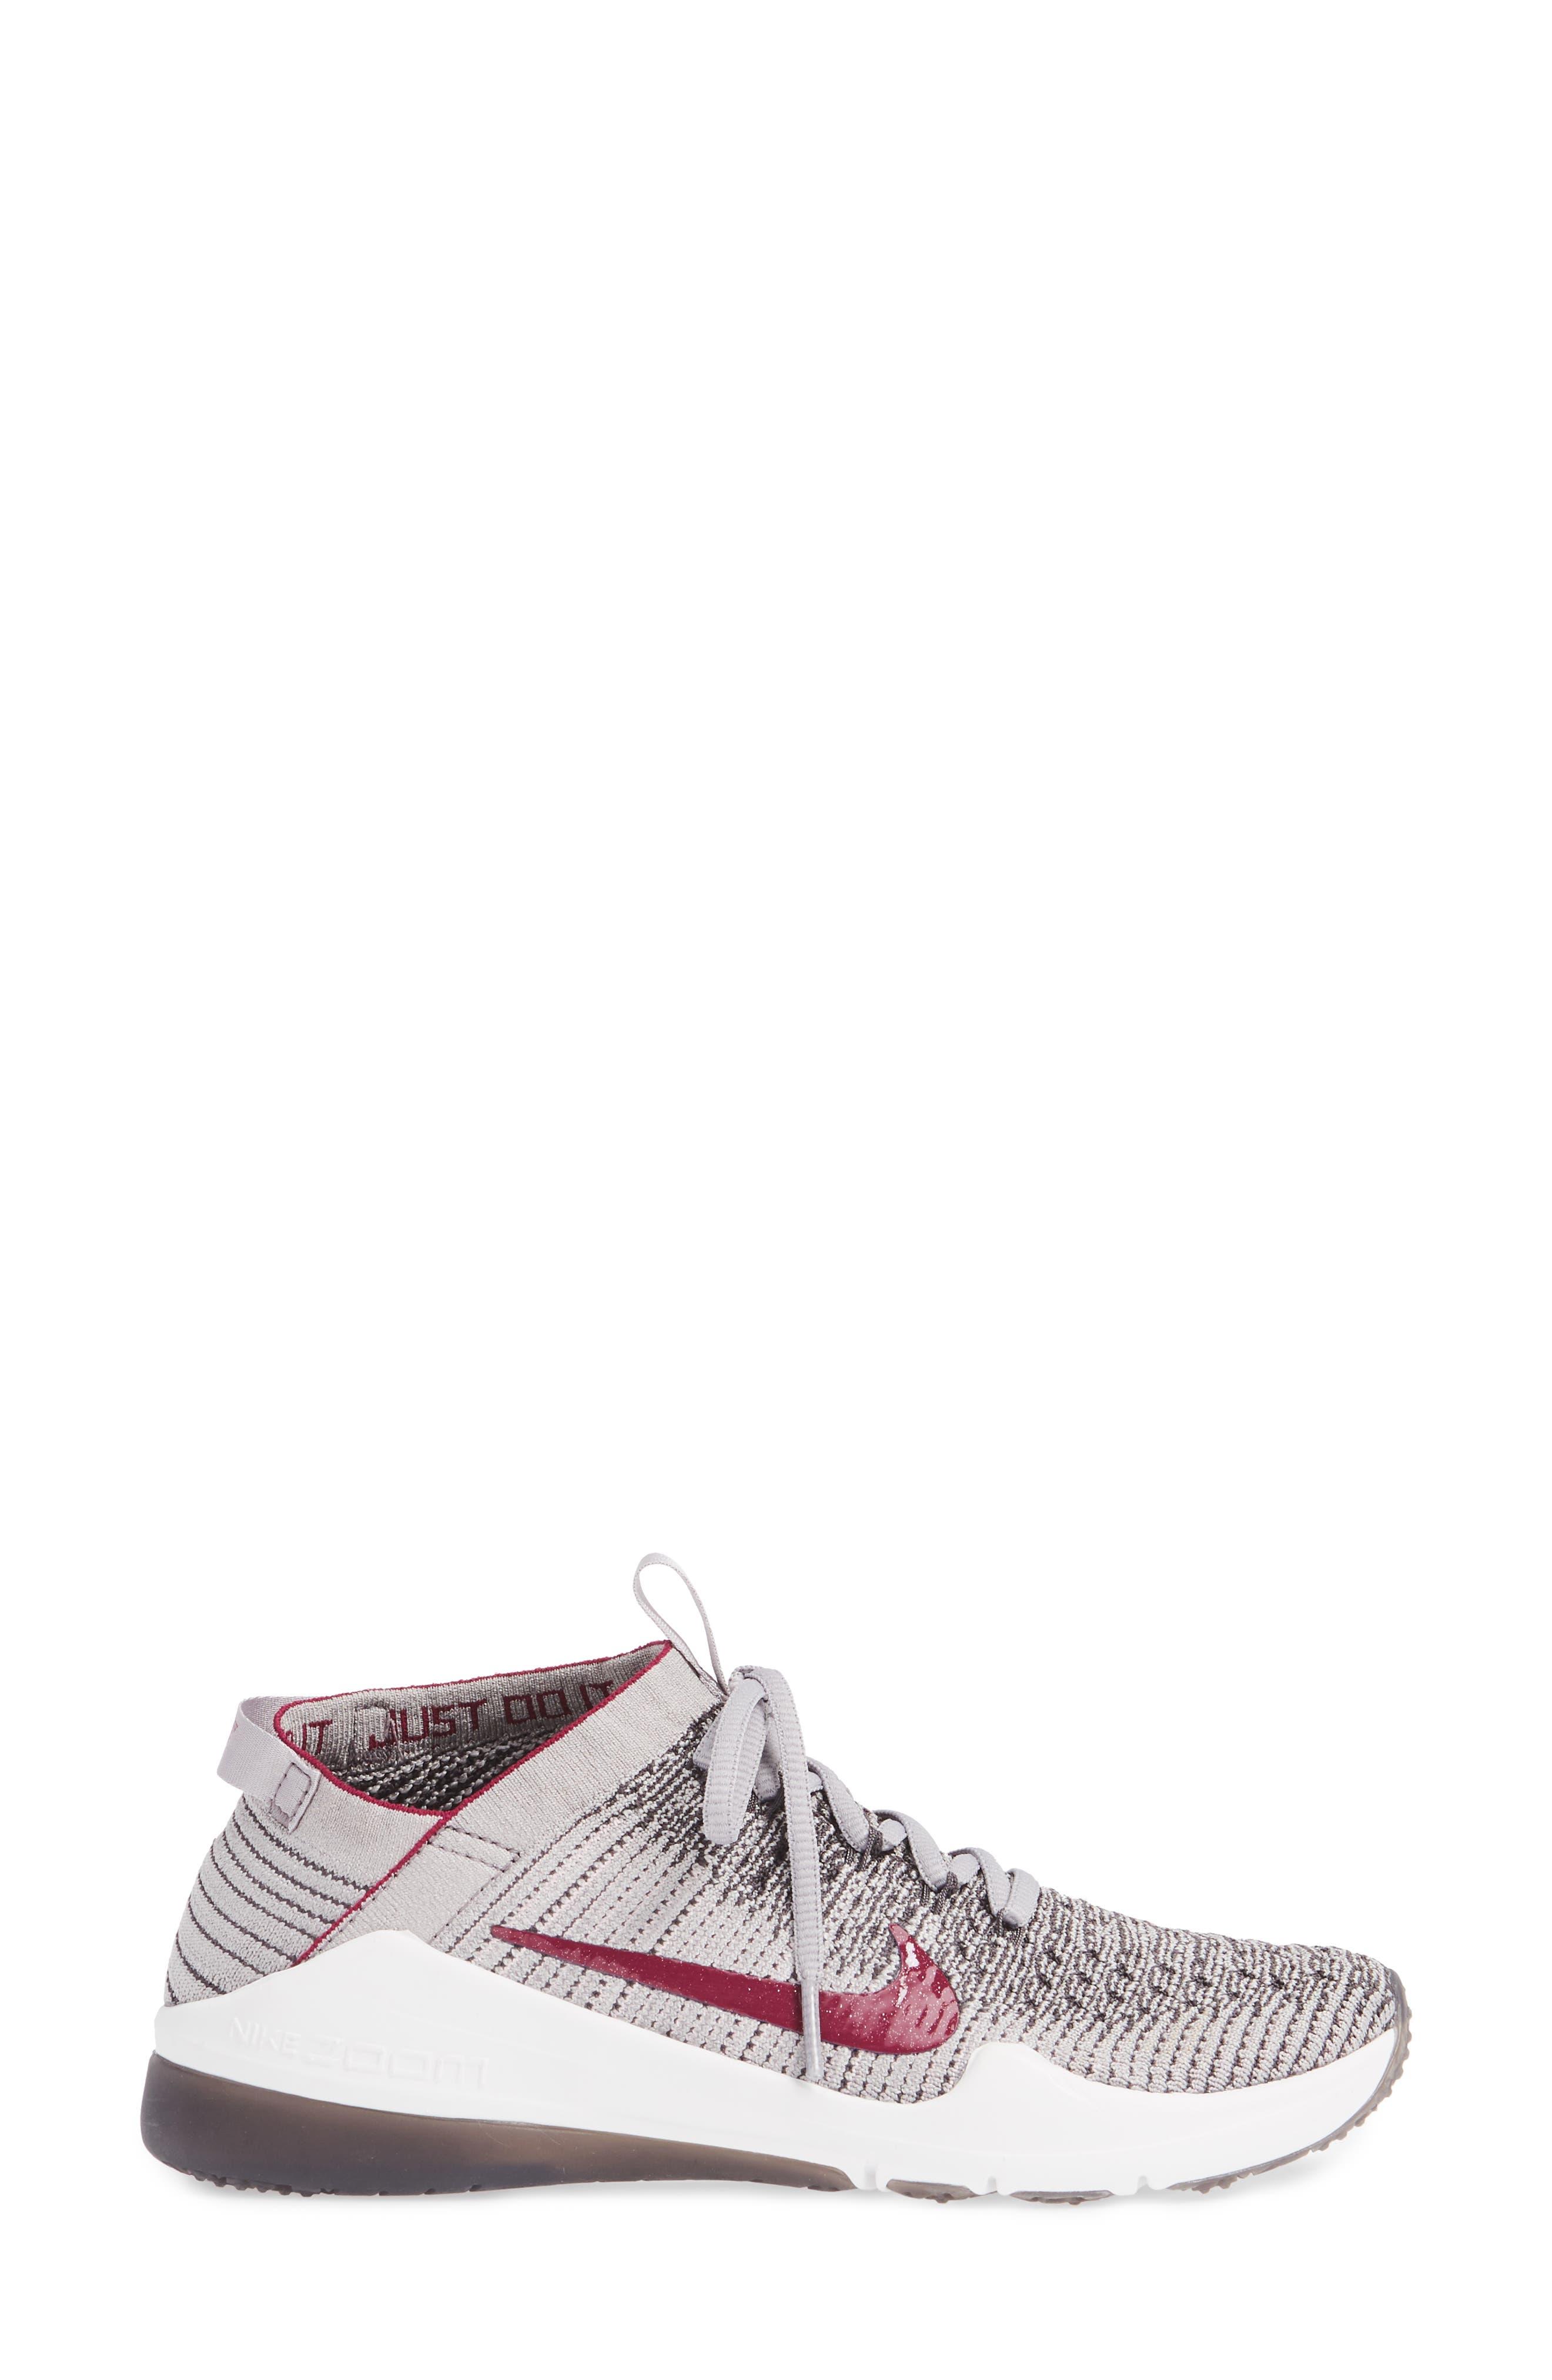 NIKE, Air Zoom Fearless Flyknit 2 Training Sneaker, Alternate thumbnail 3, color, GREY/ TRUE BERRY/ PLUM CHALK